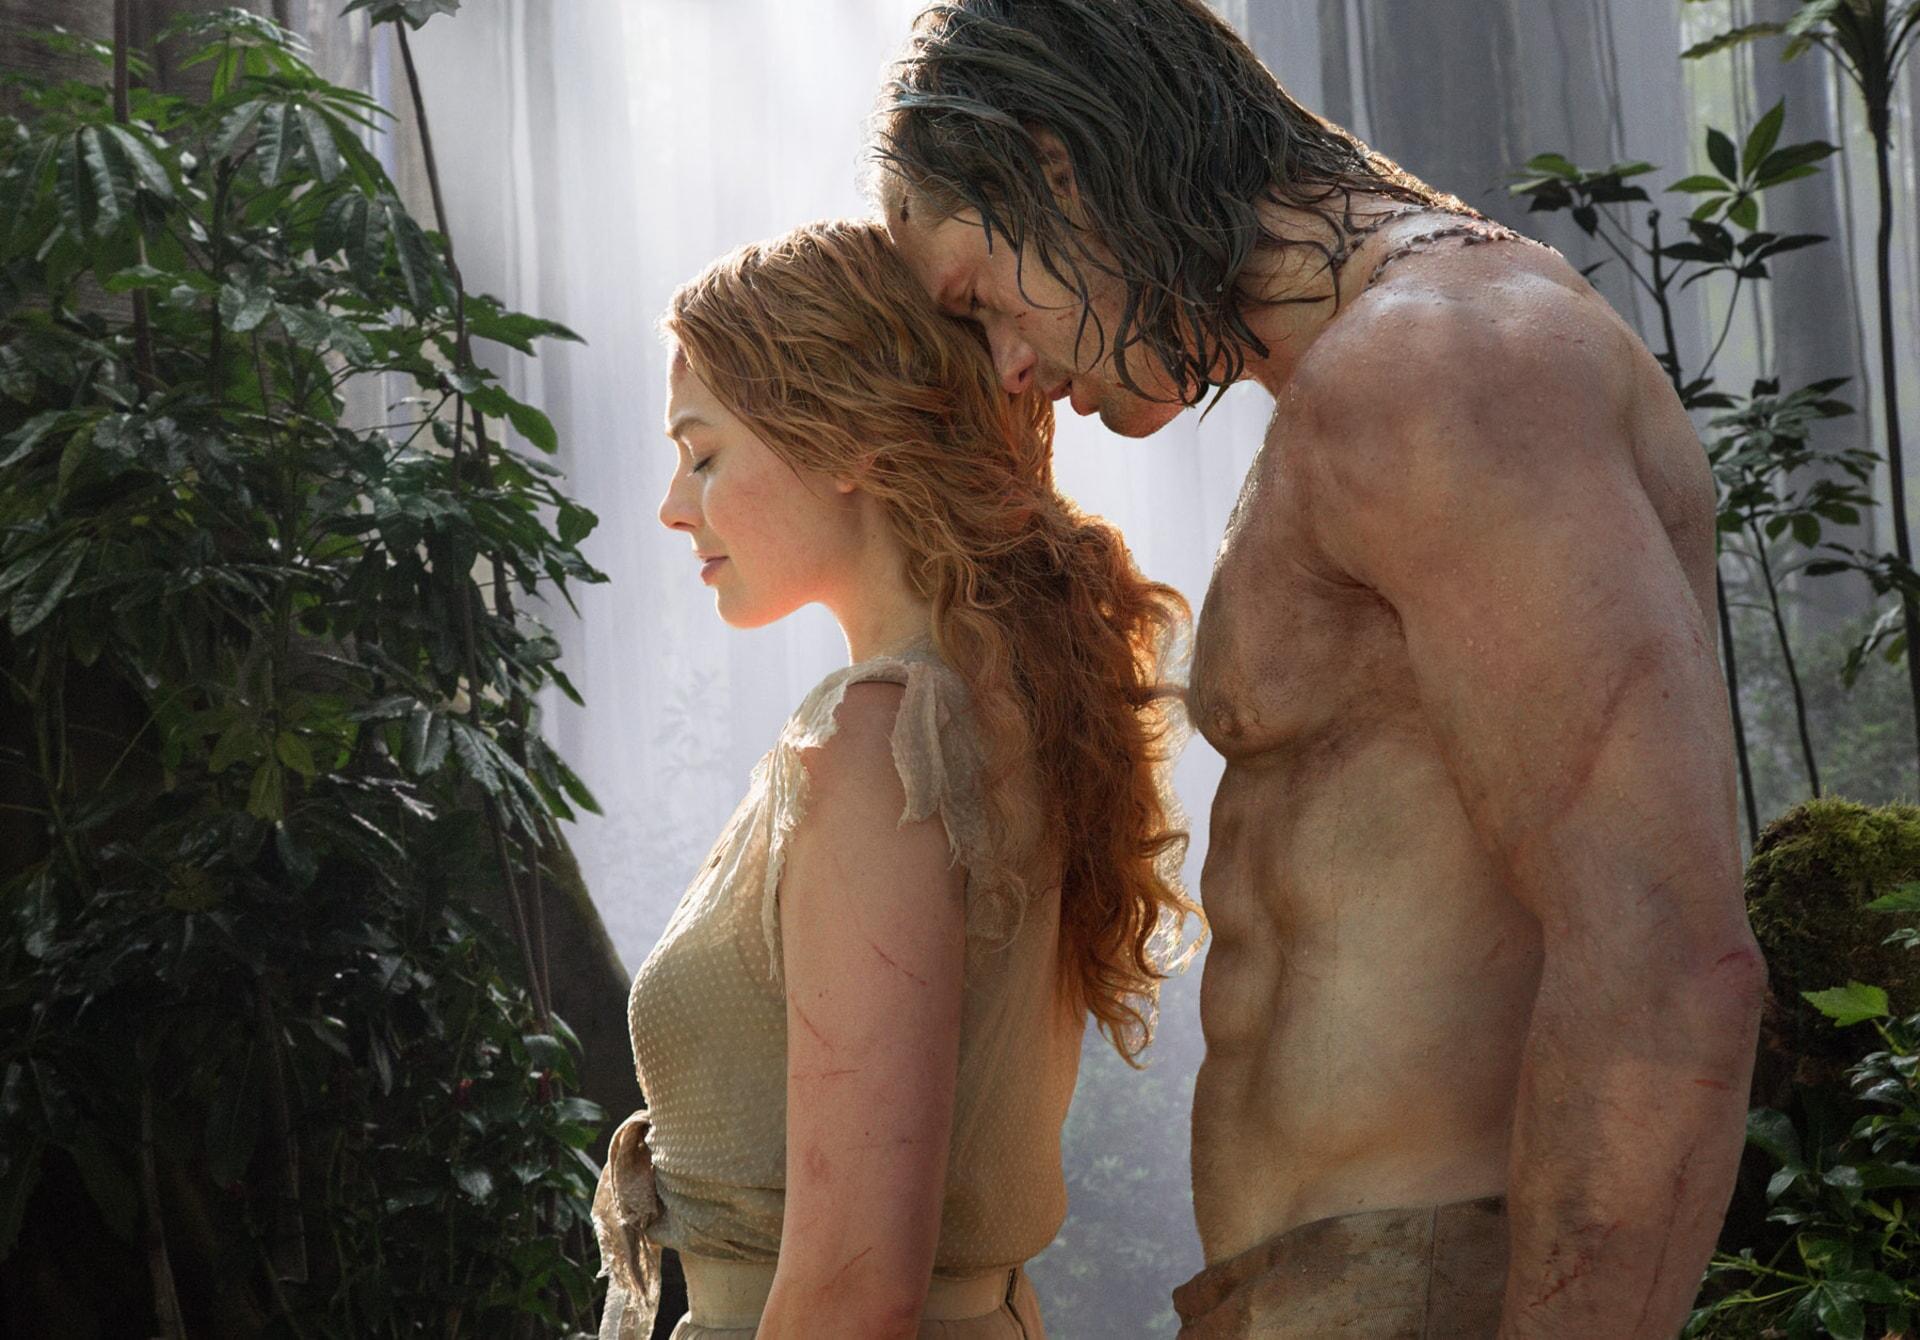 Margot Robbie as Jane Porter and Alexander Skarsgård as Tarzan standing next to each other